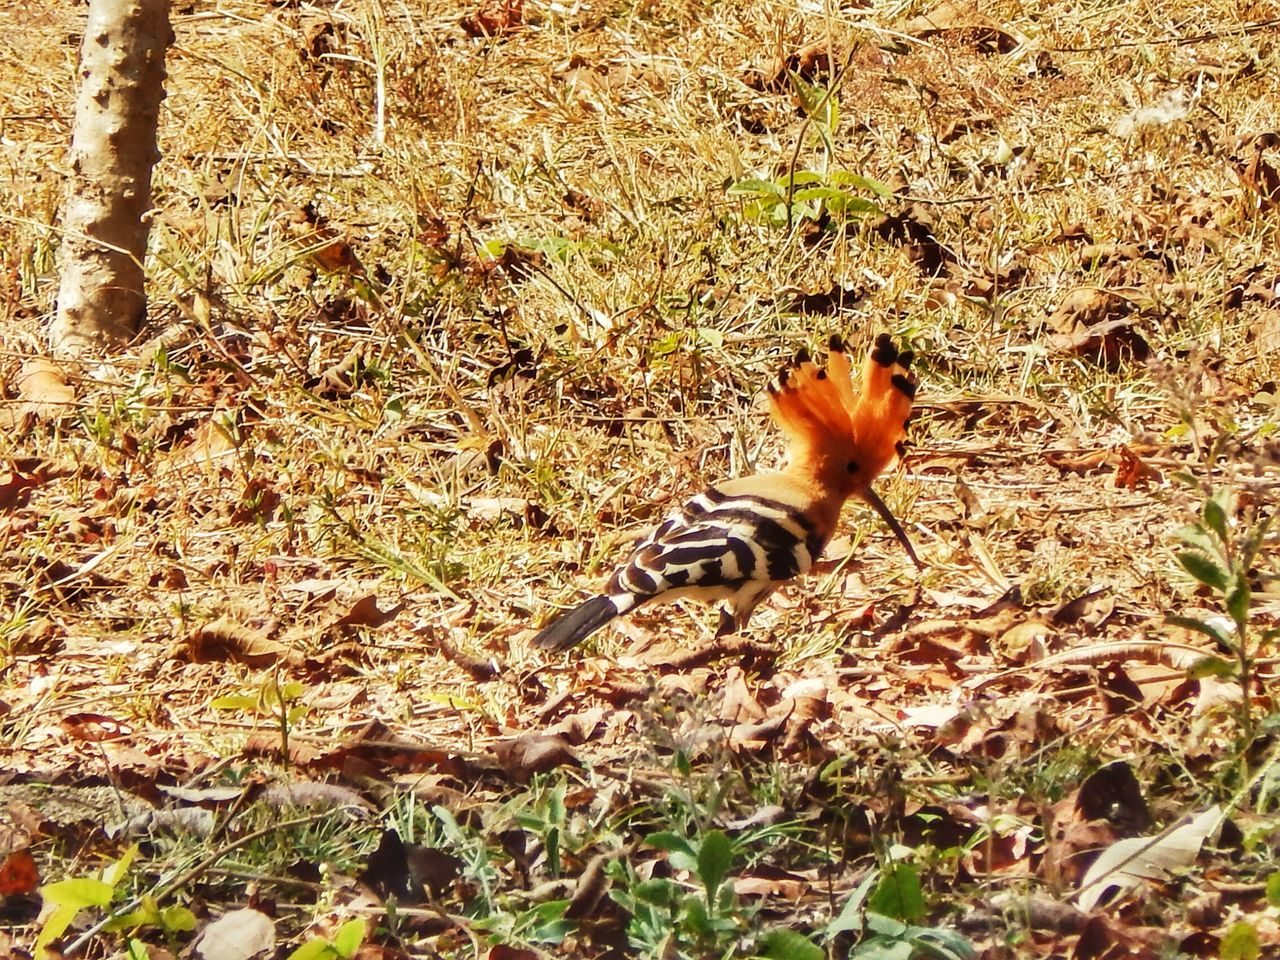 Regular visitor this time of year. Hoopoe EyeEm Birds Crest Digging EyeEm Nature Lover EyeEm Thailand